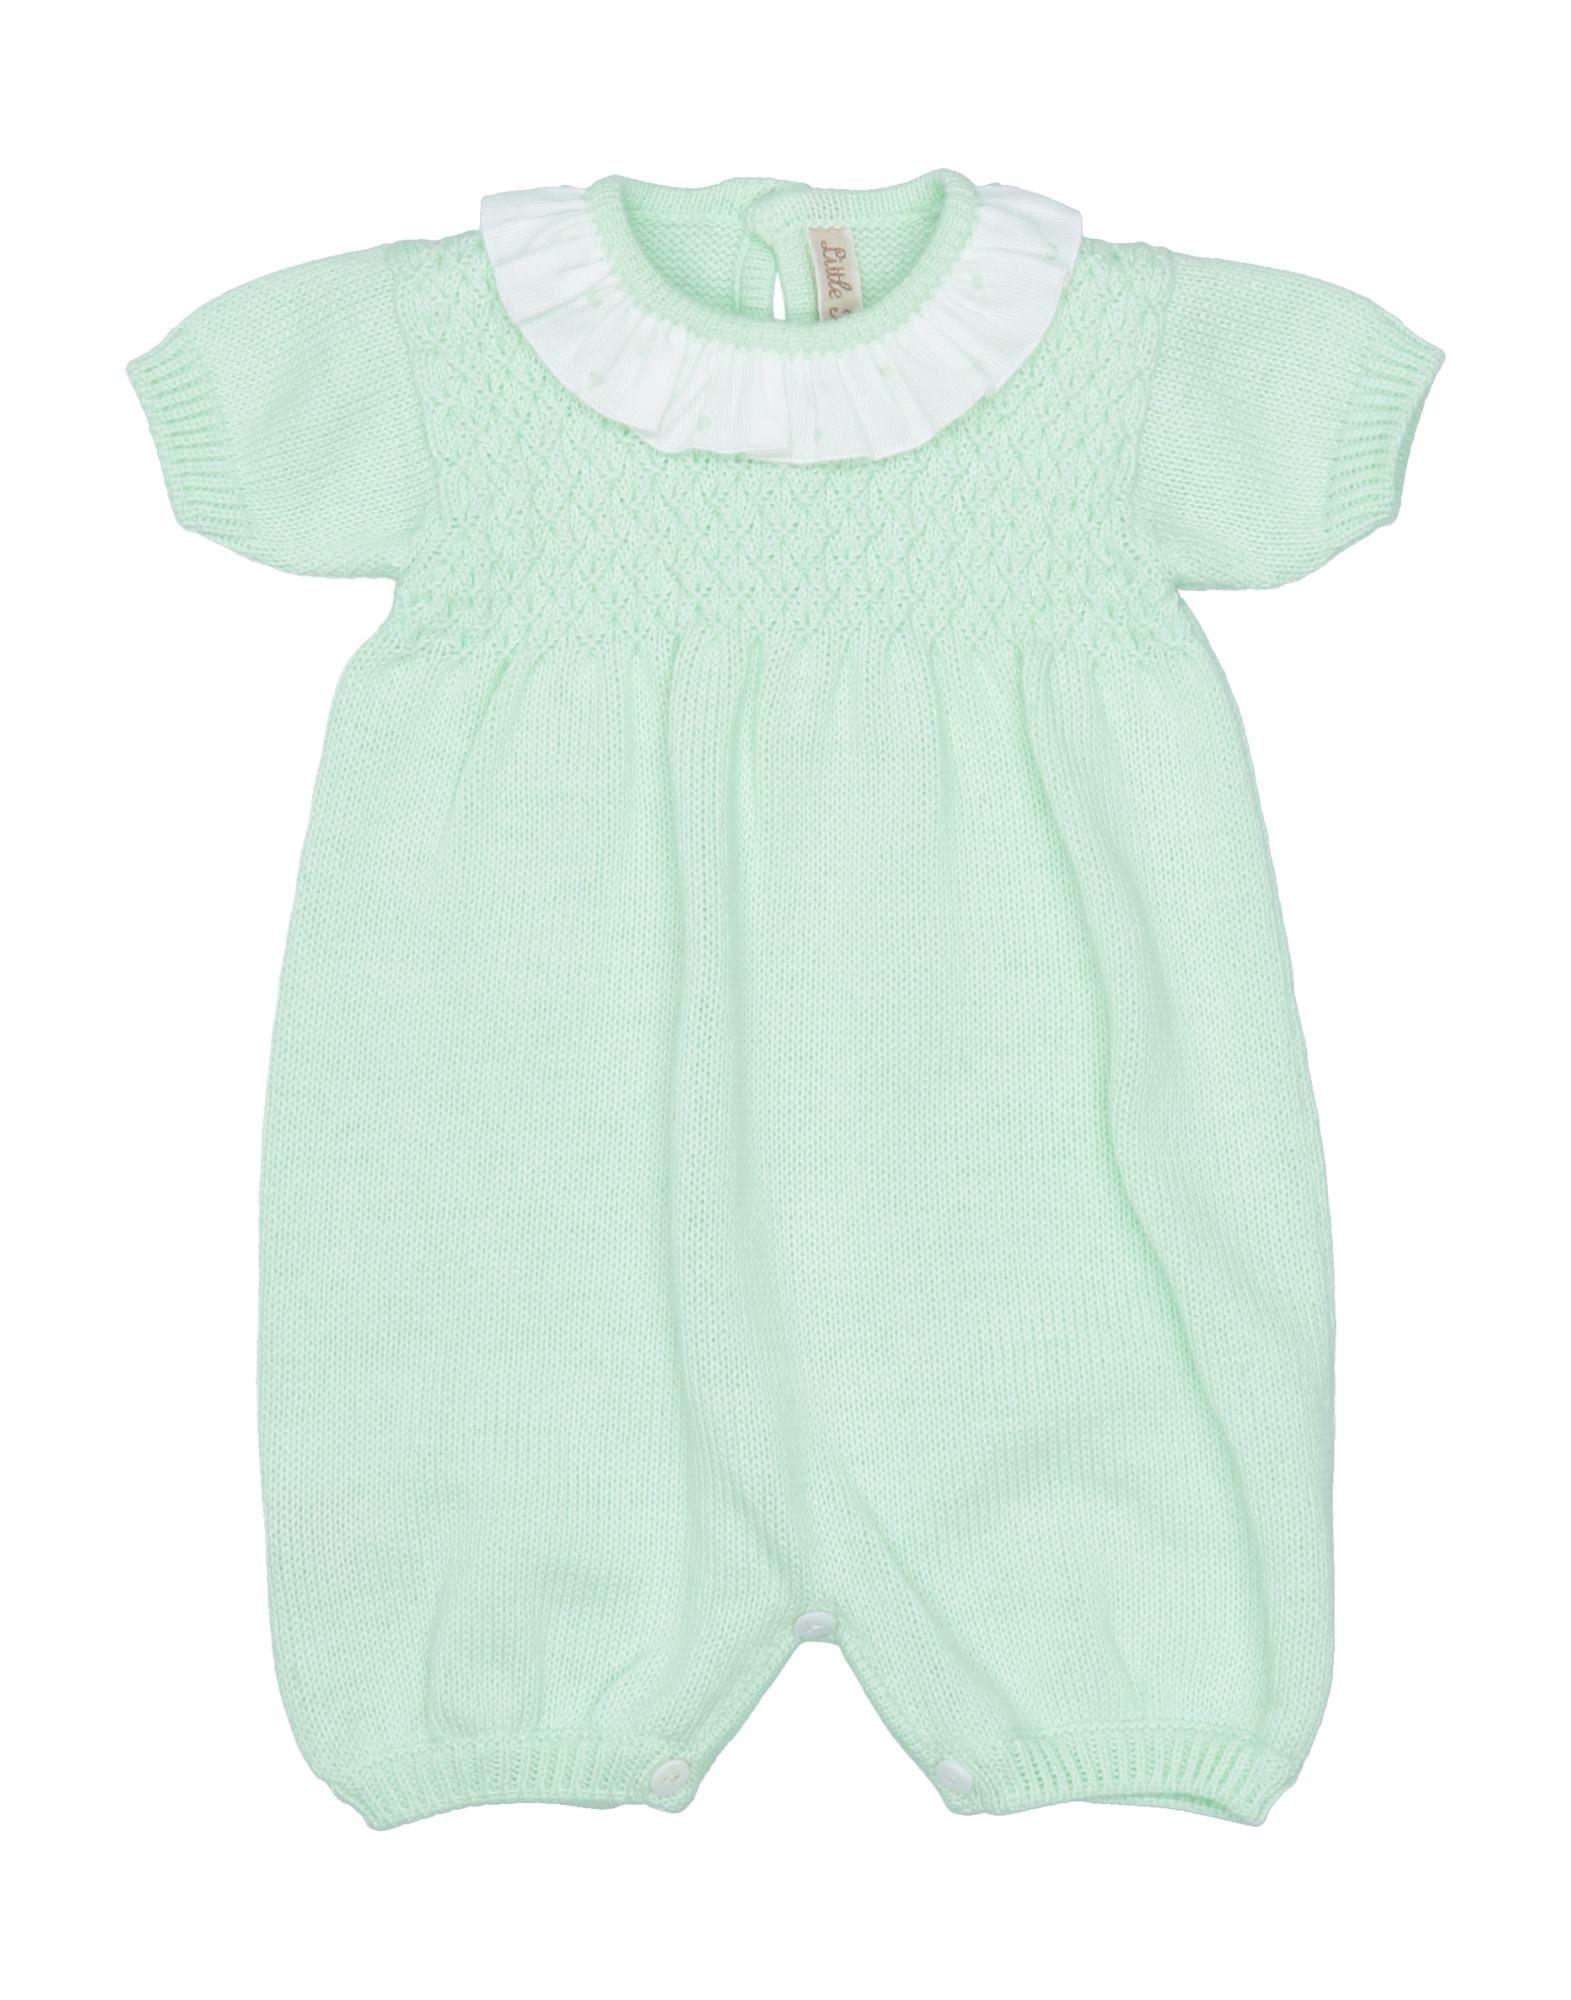 YOOX.COM(ユークス)《セール開催中》LITTLE BEAR ガールズ 0-24 ヶ月 乳幼児用ロンパース ライトグリーン 1 コットン 100%